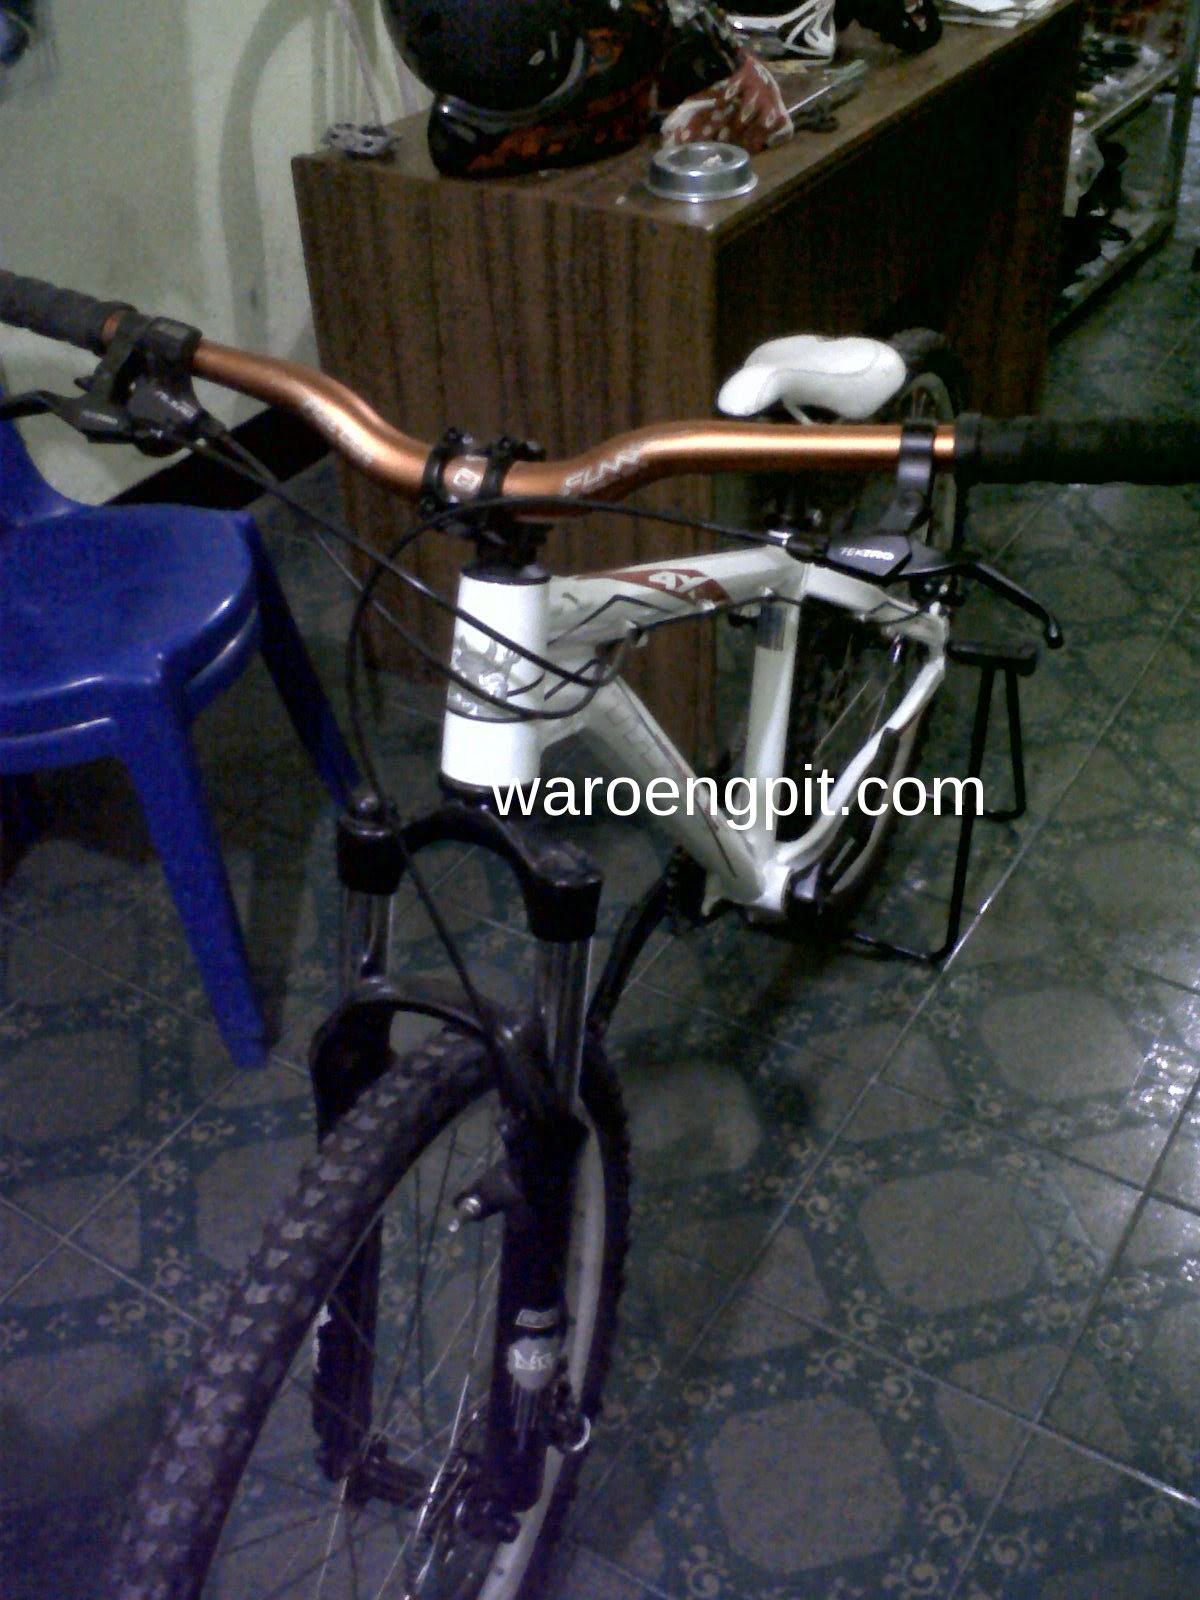 Sepeda Gunung Rakitan merek Thrill 4x 2012 Bekas-2